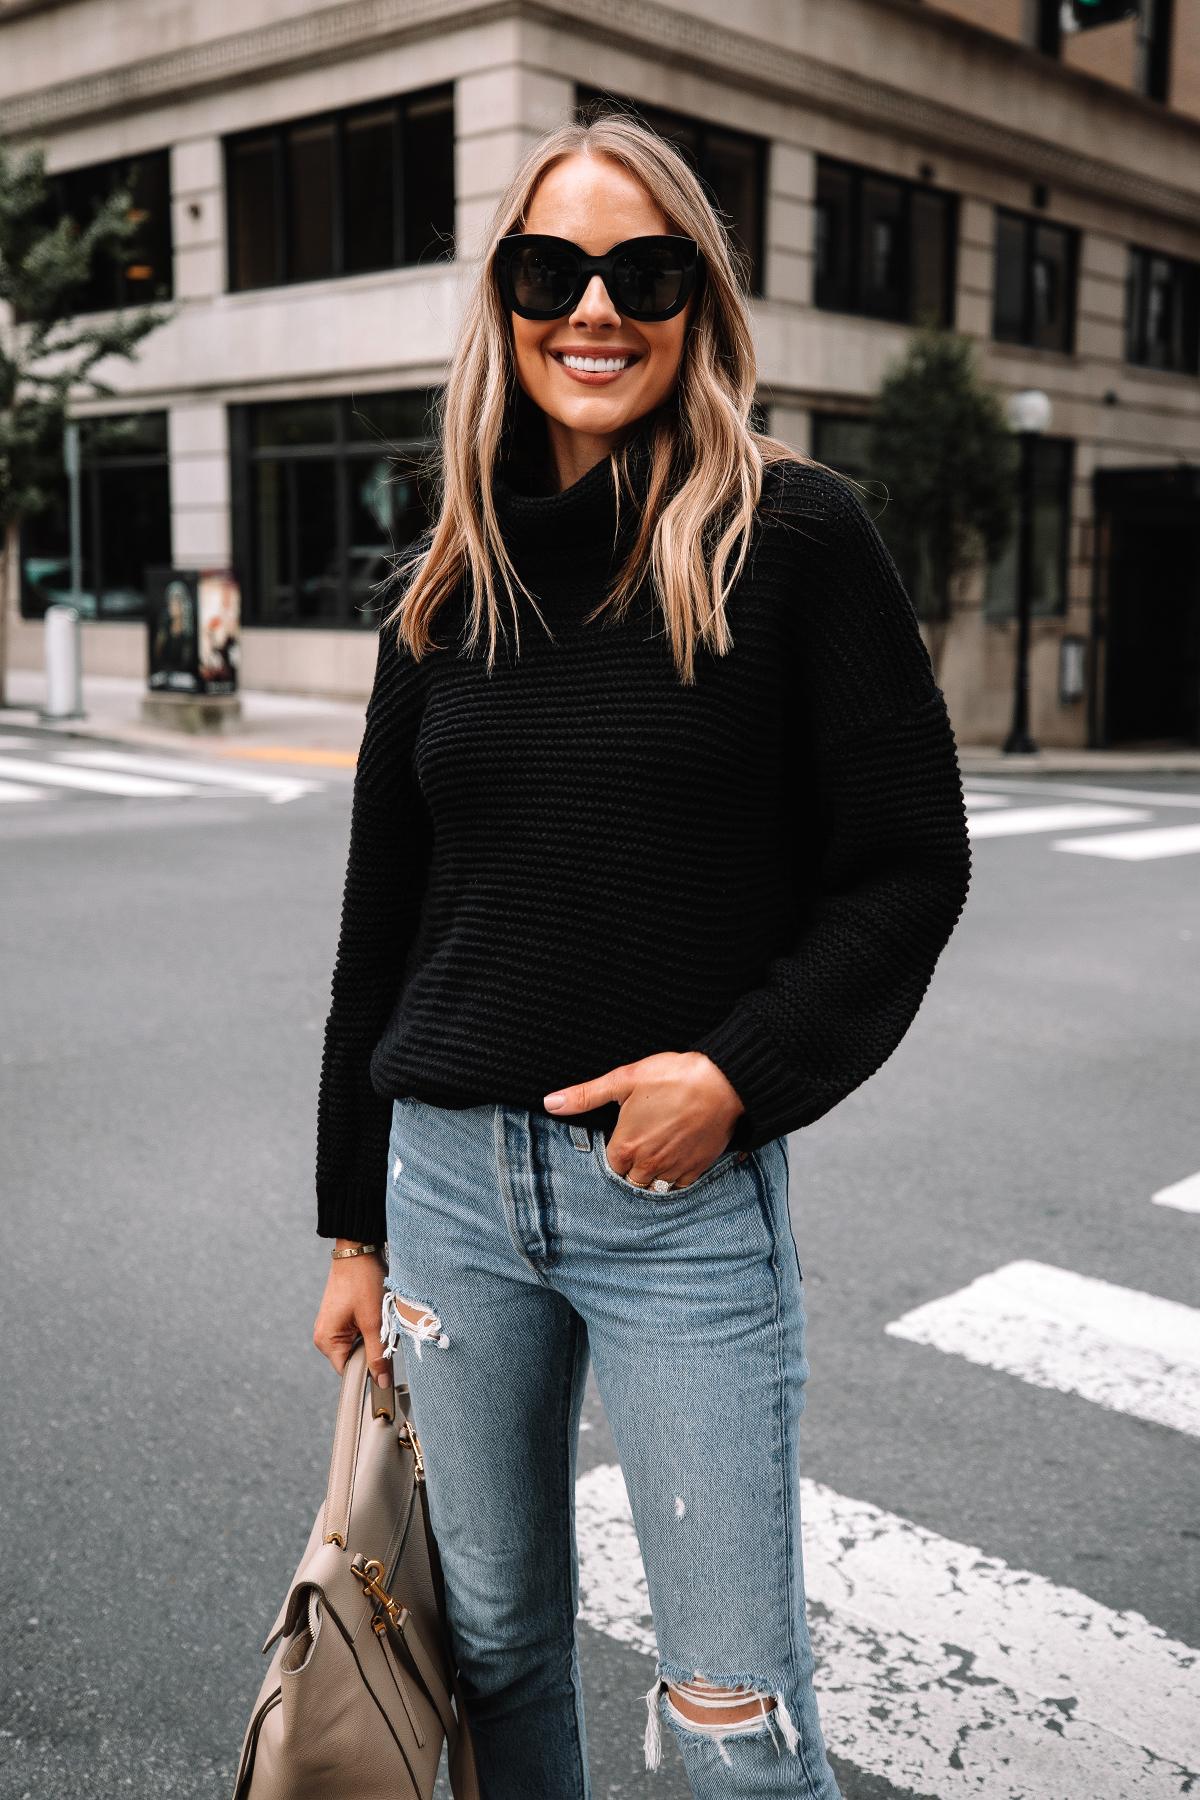 Fashion Jackson Wearing Amazon Fashion Black Turtleneck Sweater Levis Ripped Jeans